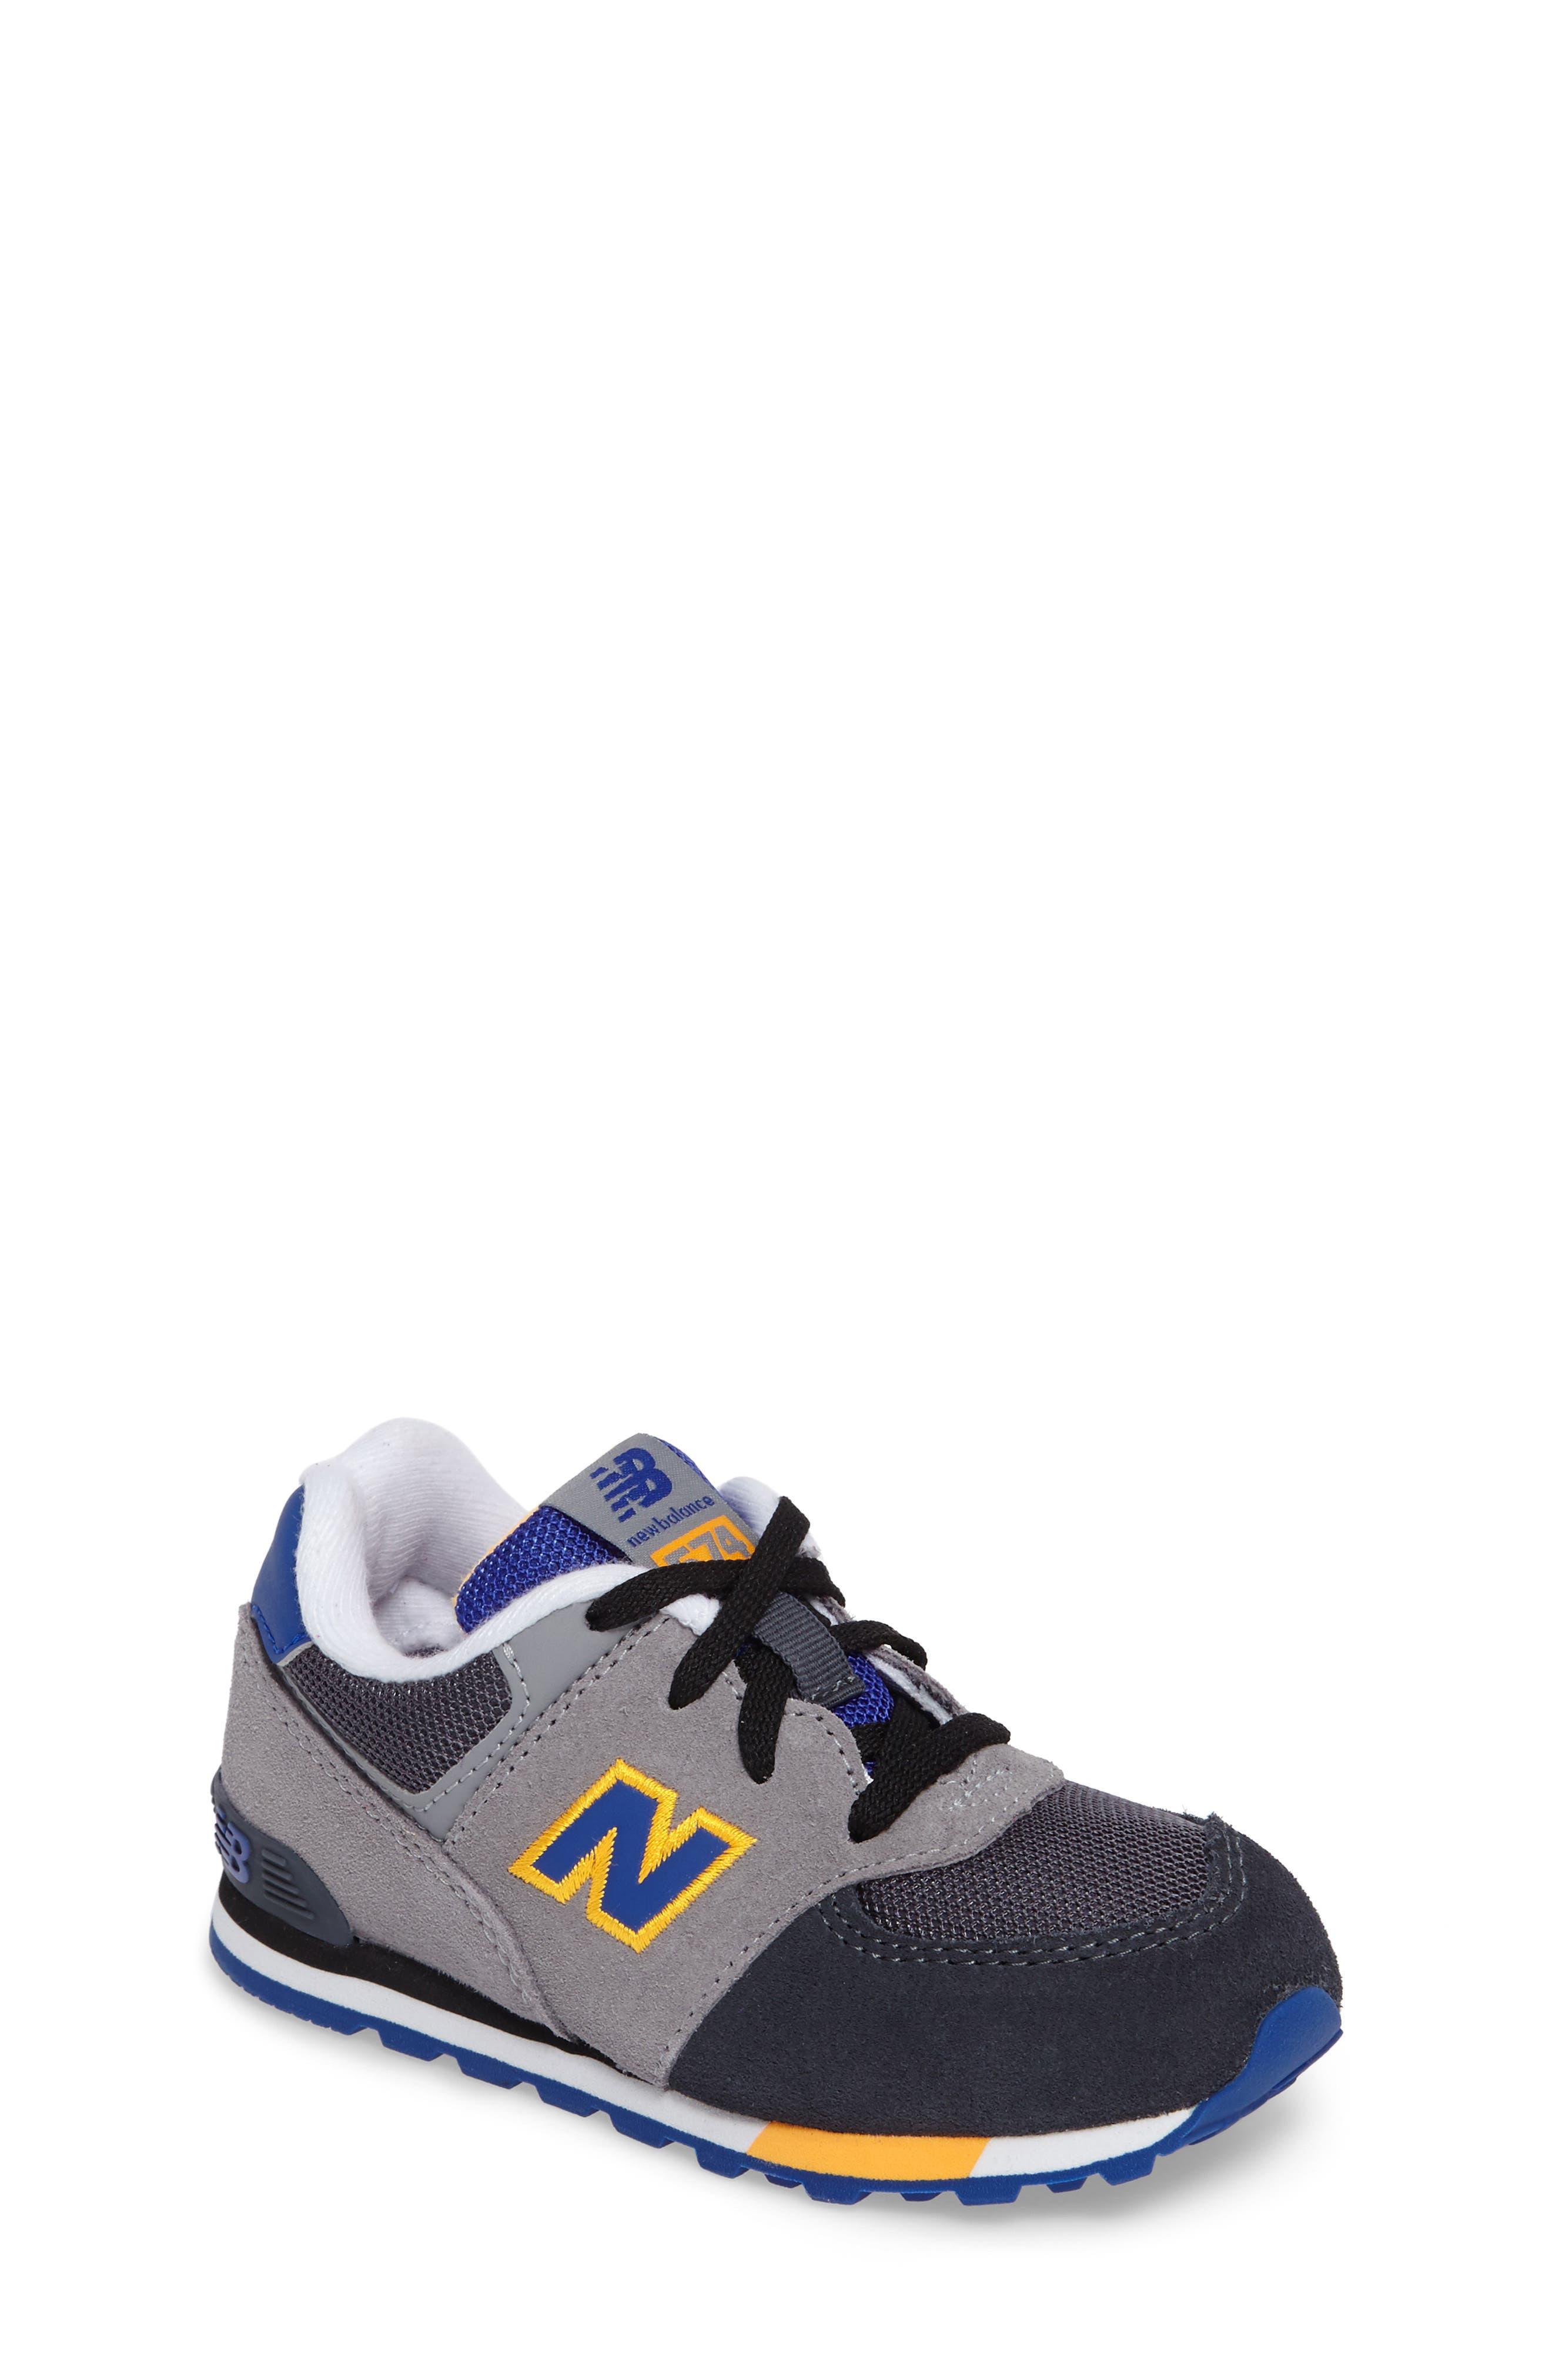 Alternate Image 1 Selected - New Balance 574 Cut & Paste Sneaker (Baby, Walker & Toddler)